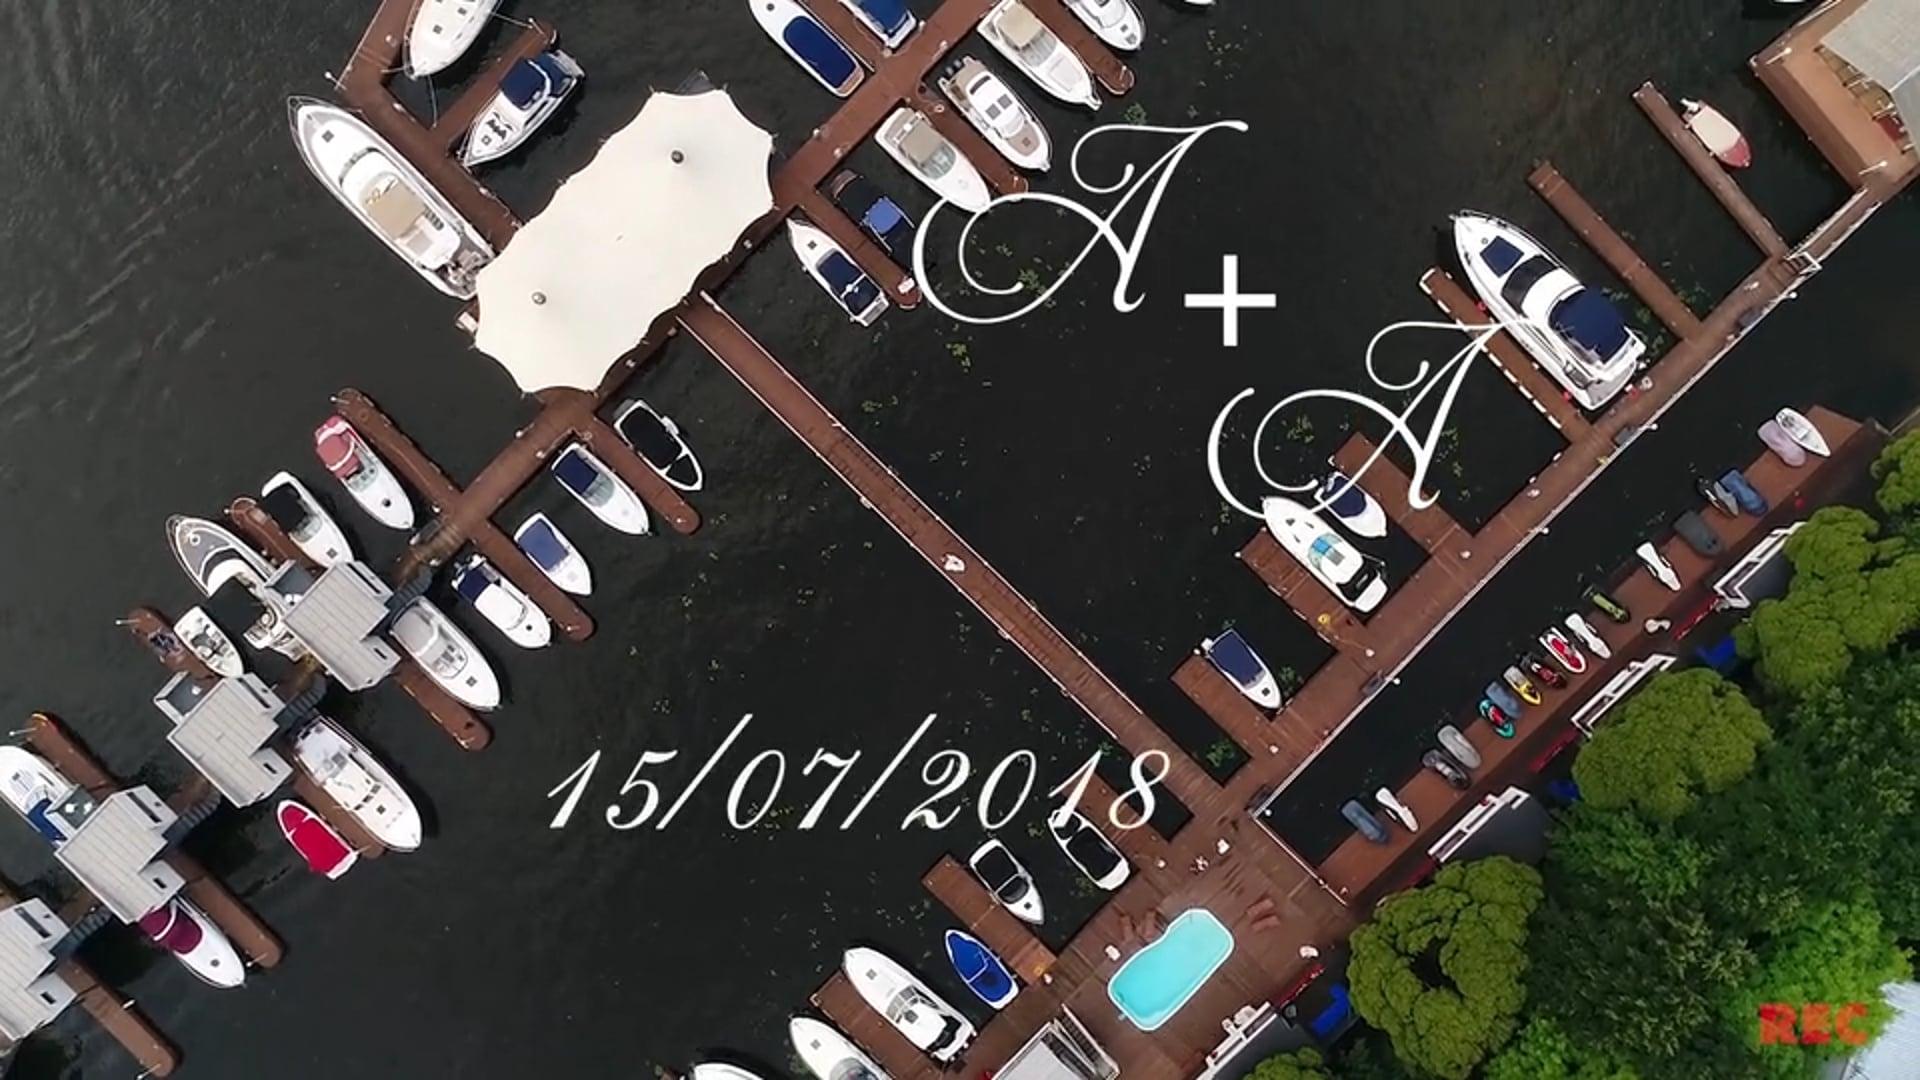 Александр и Алина 15.07.2018